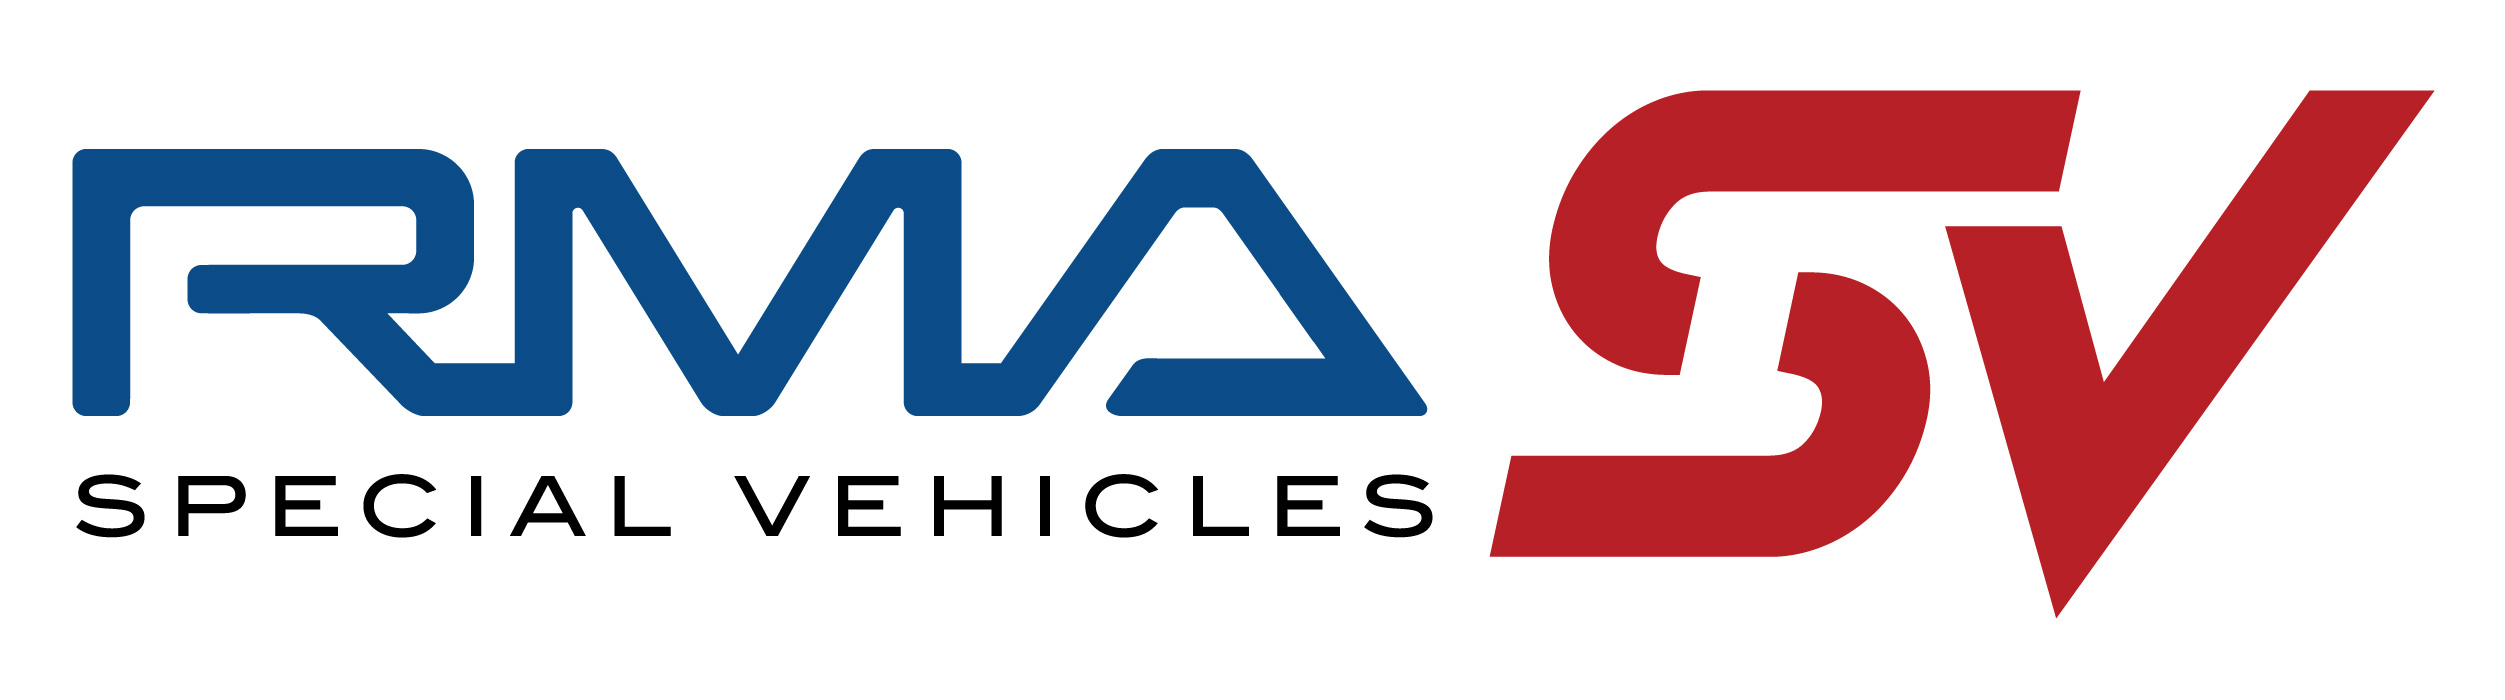 RMA Special Vehicles – RMA Group